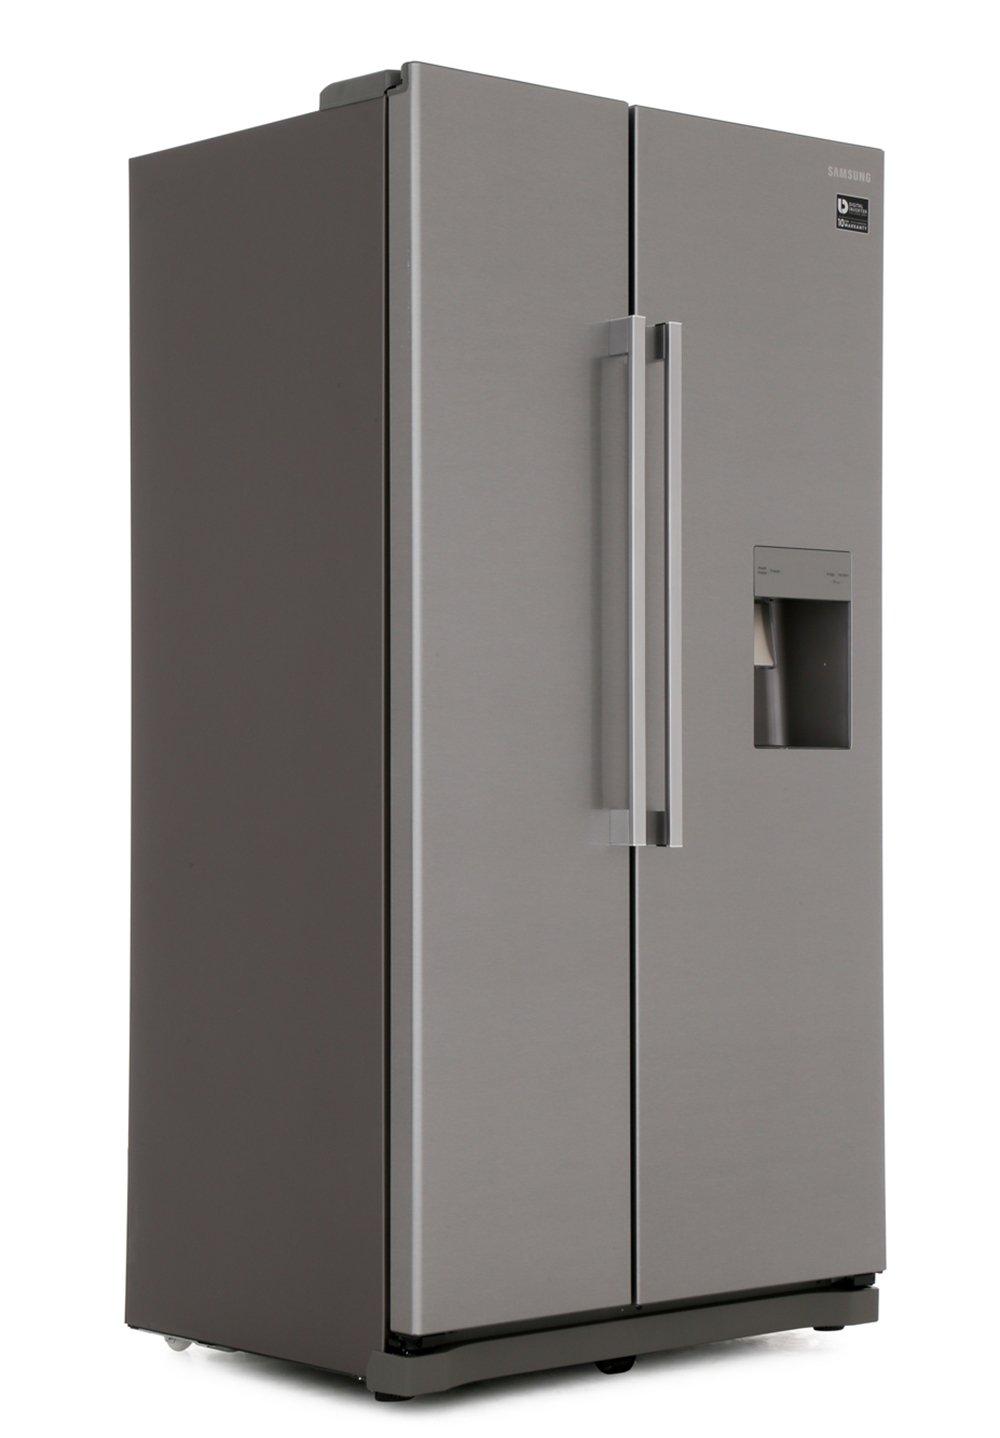 Samsung RS52N3313SA/EU American Fridge Freezer